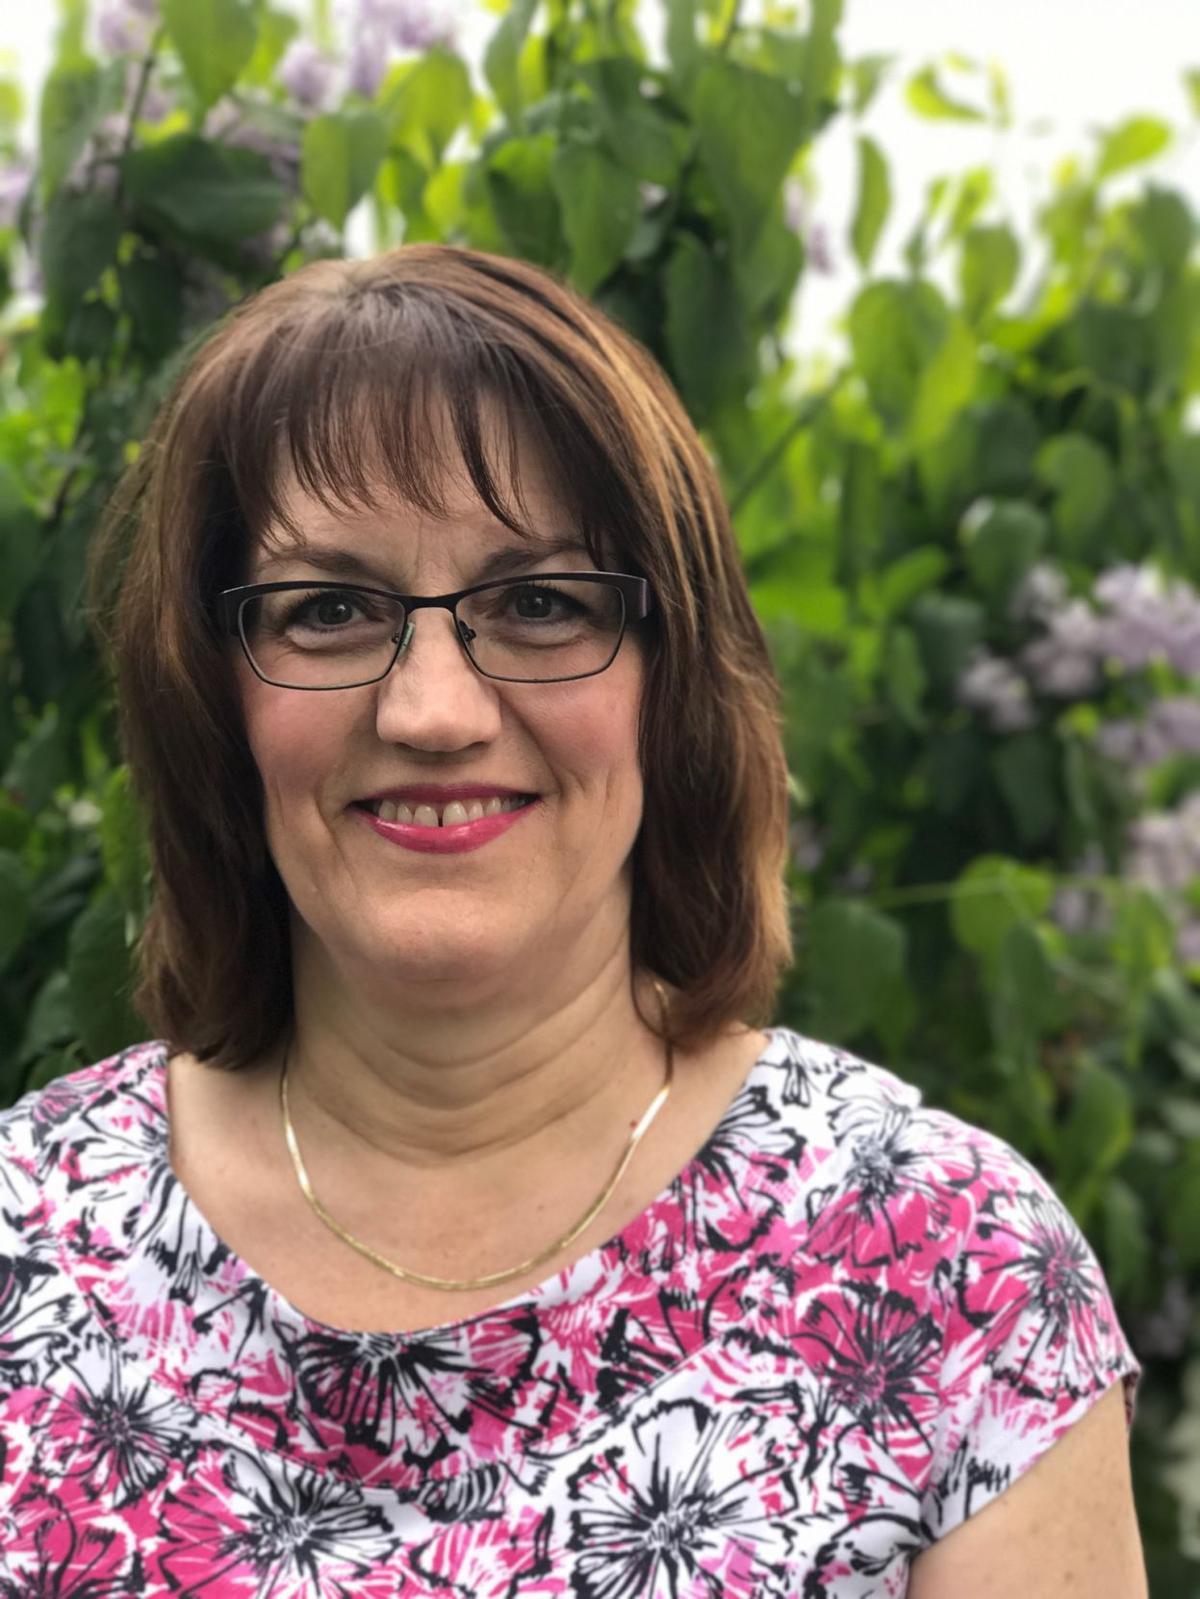 Planning & development services director named